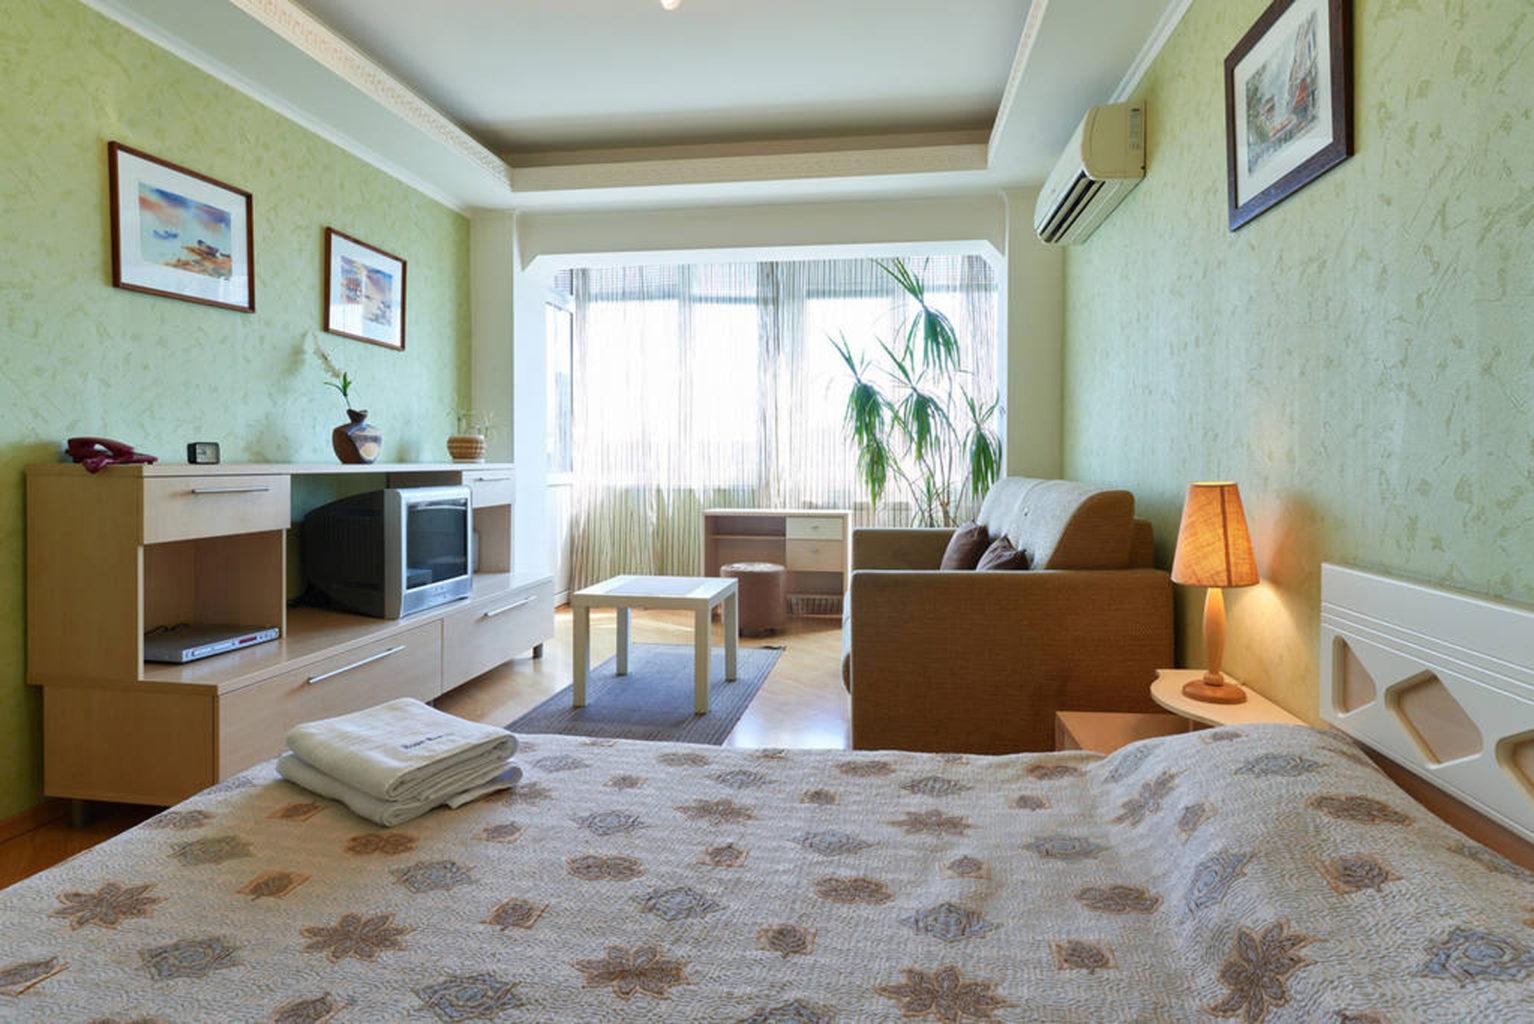 One-bedroom apartment in the center of Kiev, Sverstyuka 8